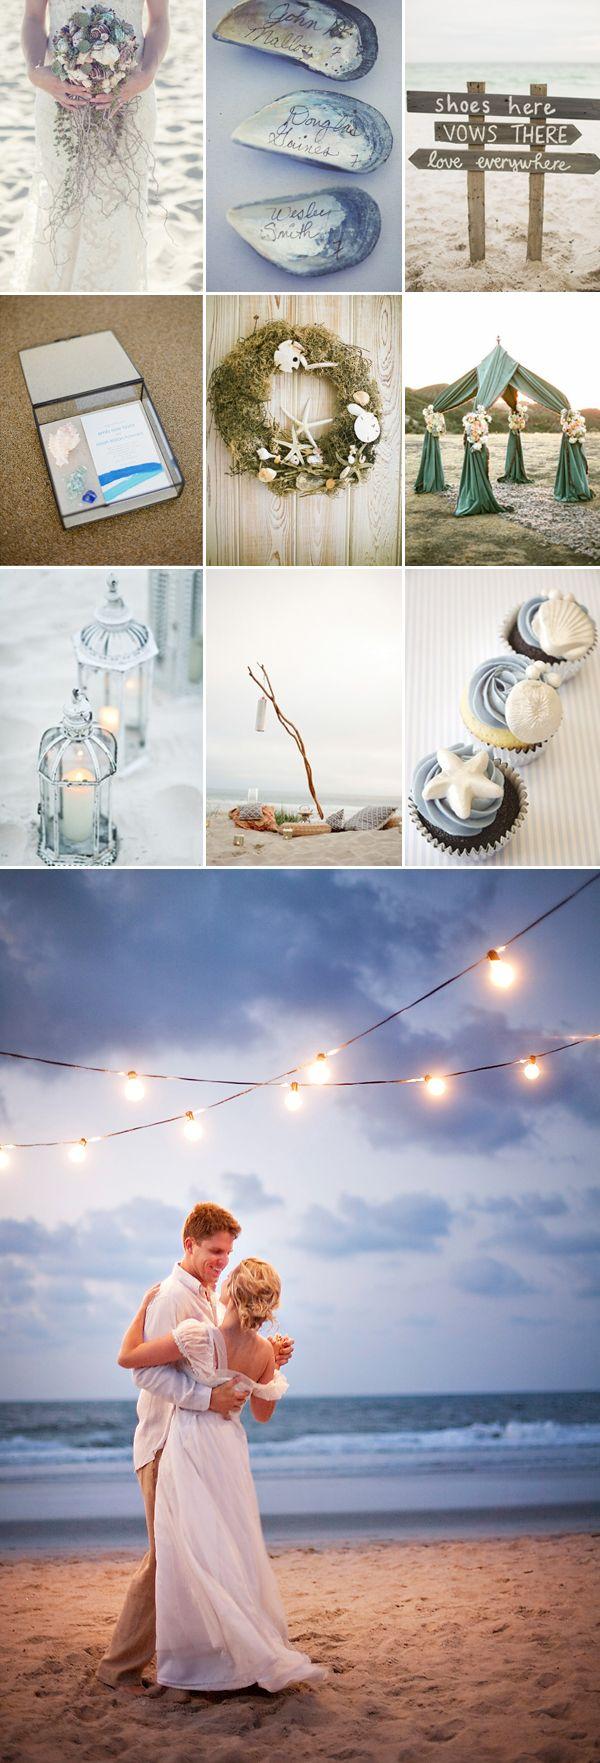 best wedding images on pinterest wedding ideas bridal bouquets